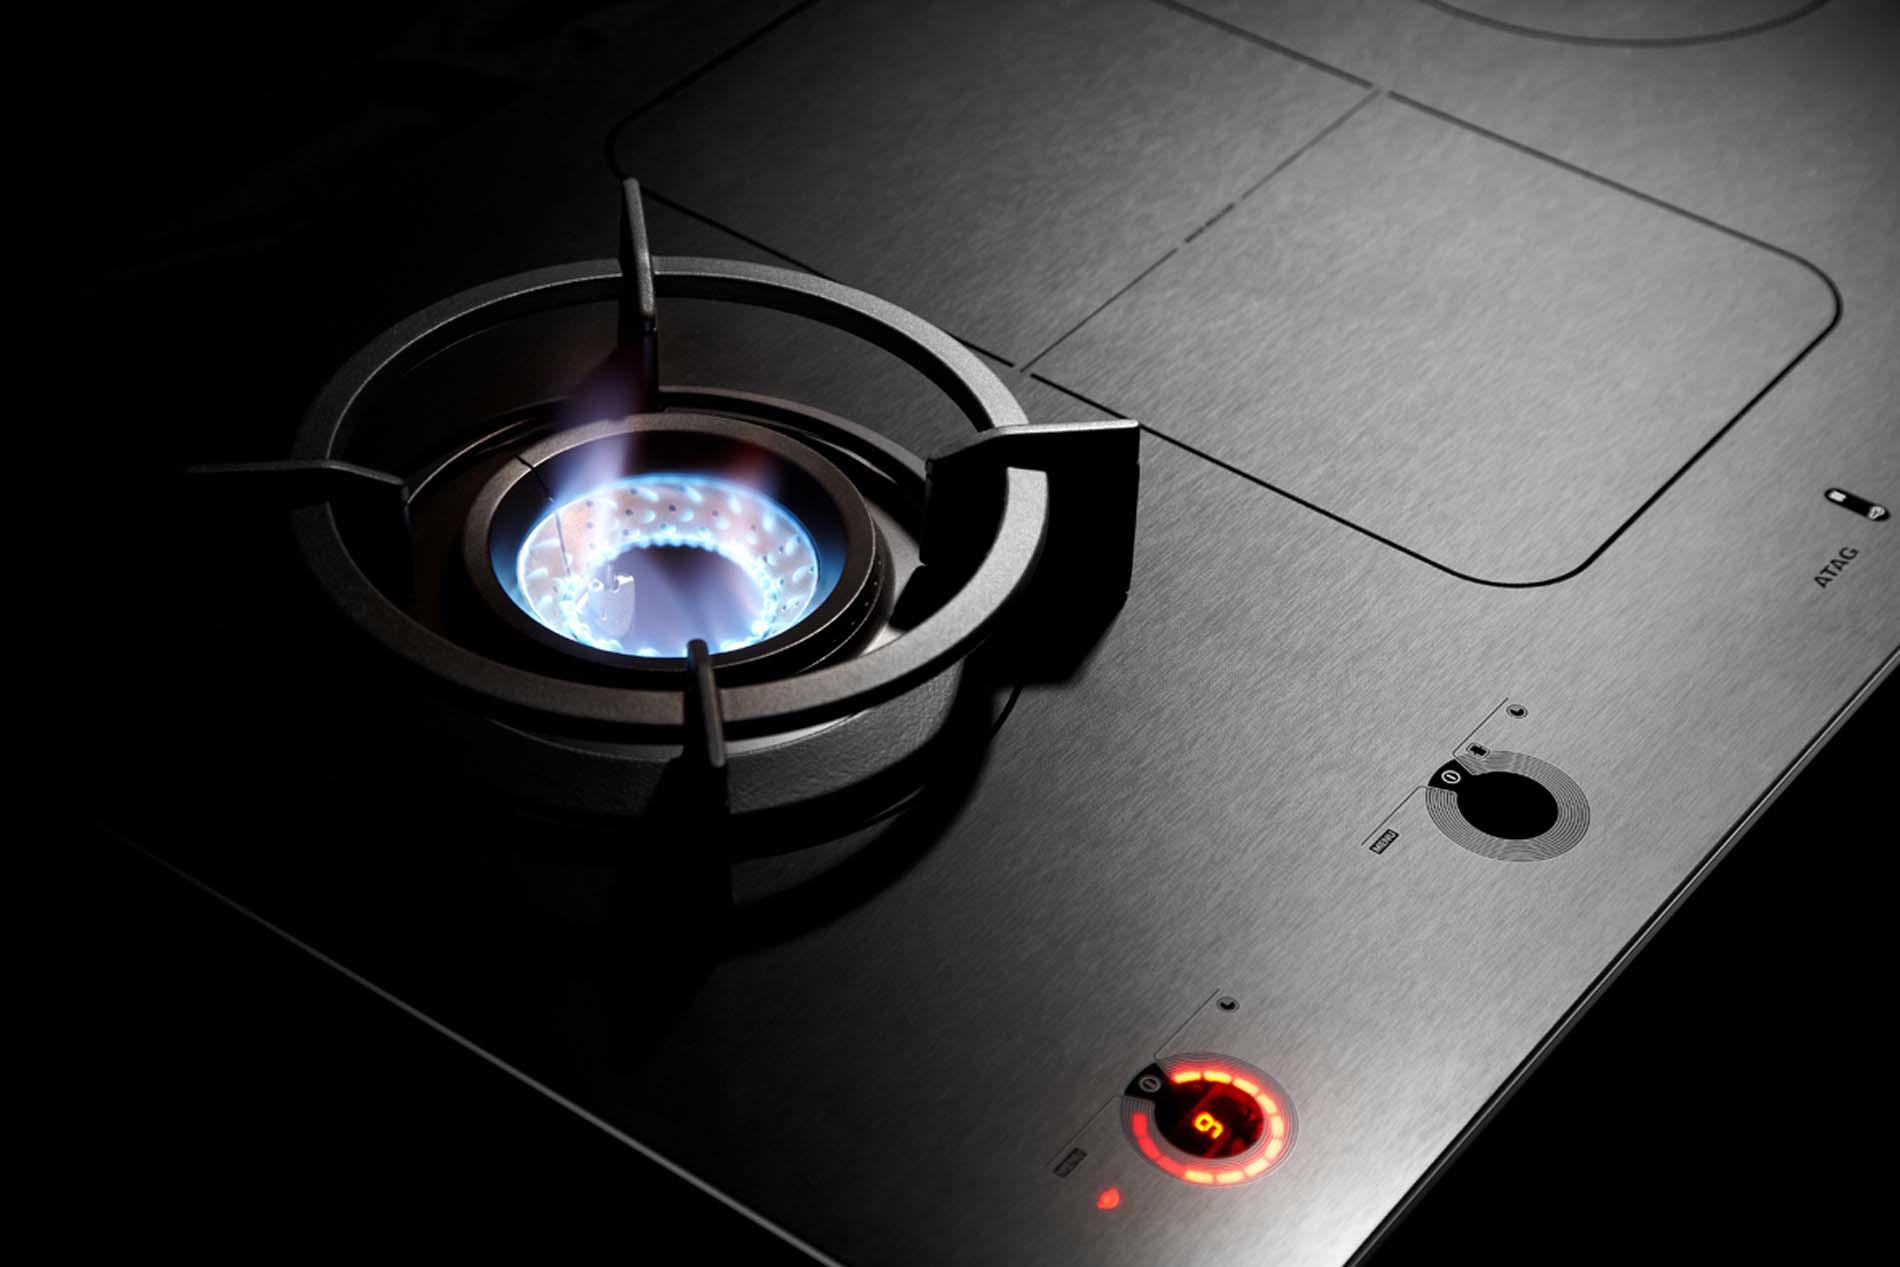 ATAG MAGNA inductie kookplaat met gas wokbrander, Keukenapparatuur ASWA Keukens